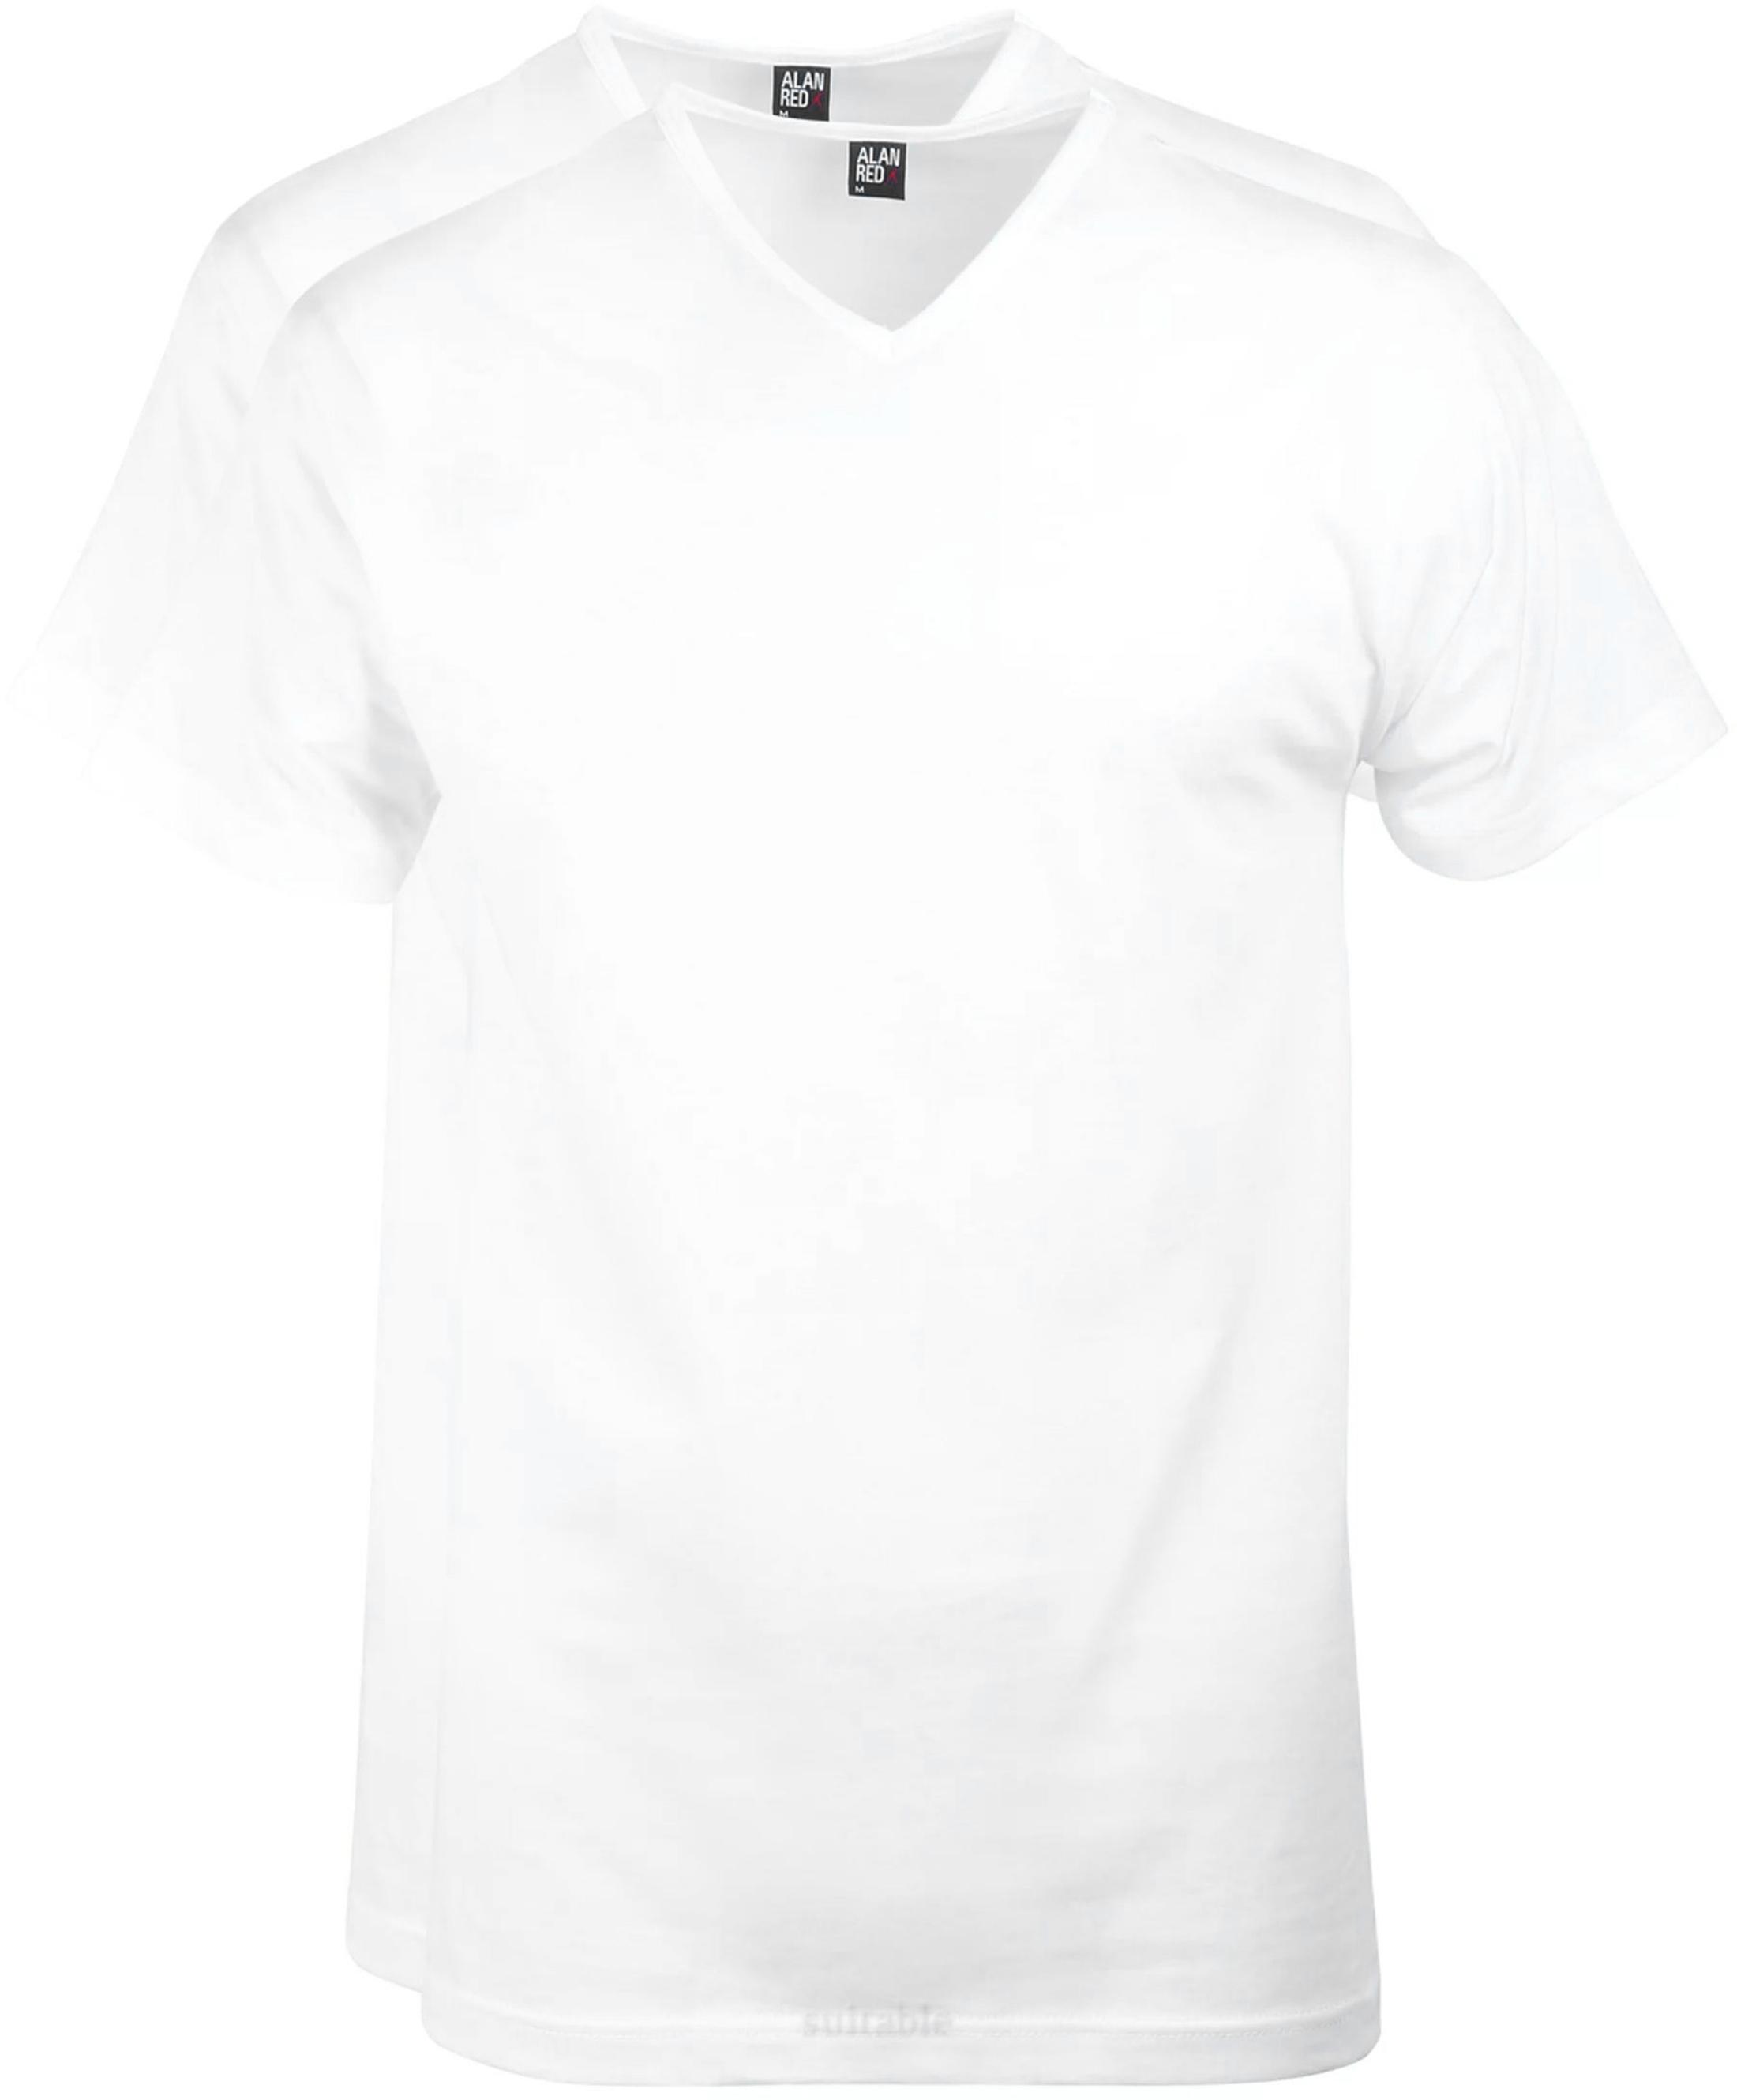 Alan Red Vermont T-Shirt V-Hals Wit (2Pack) foto 0